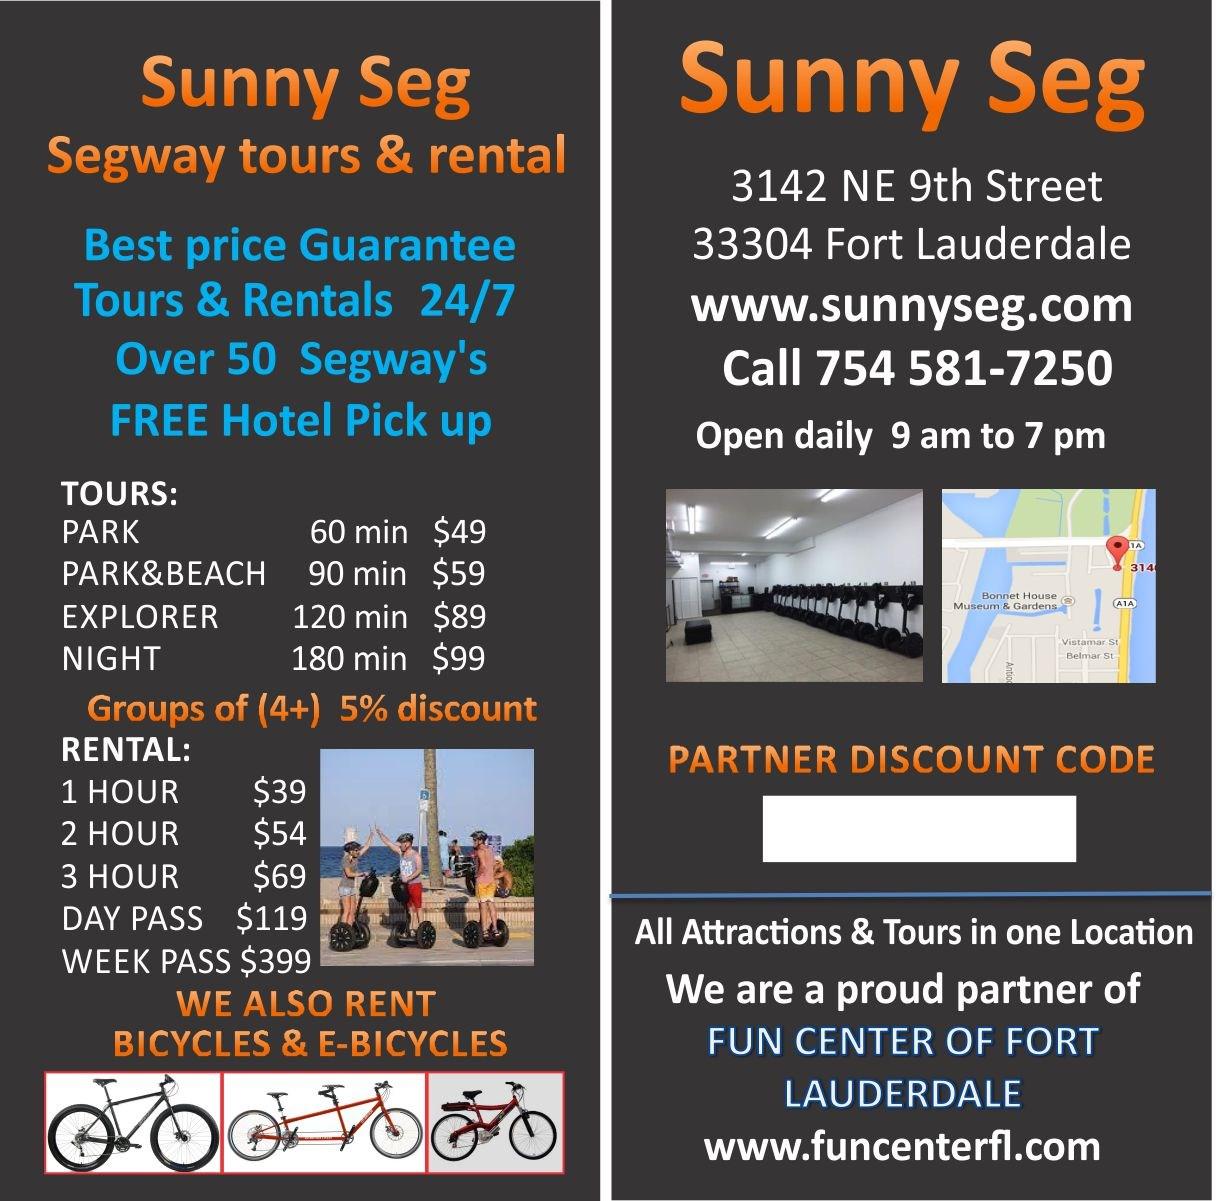 Sunny Seg Segway Tours & Rentals.